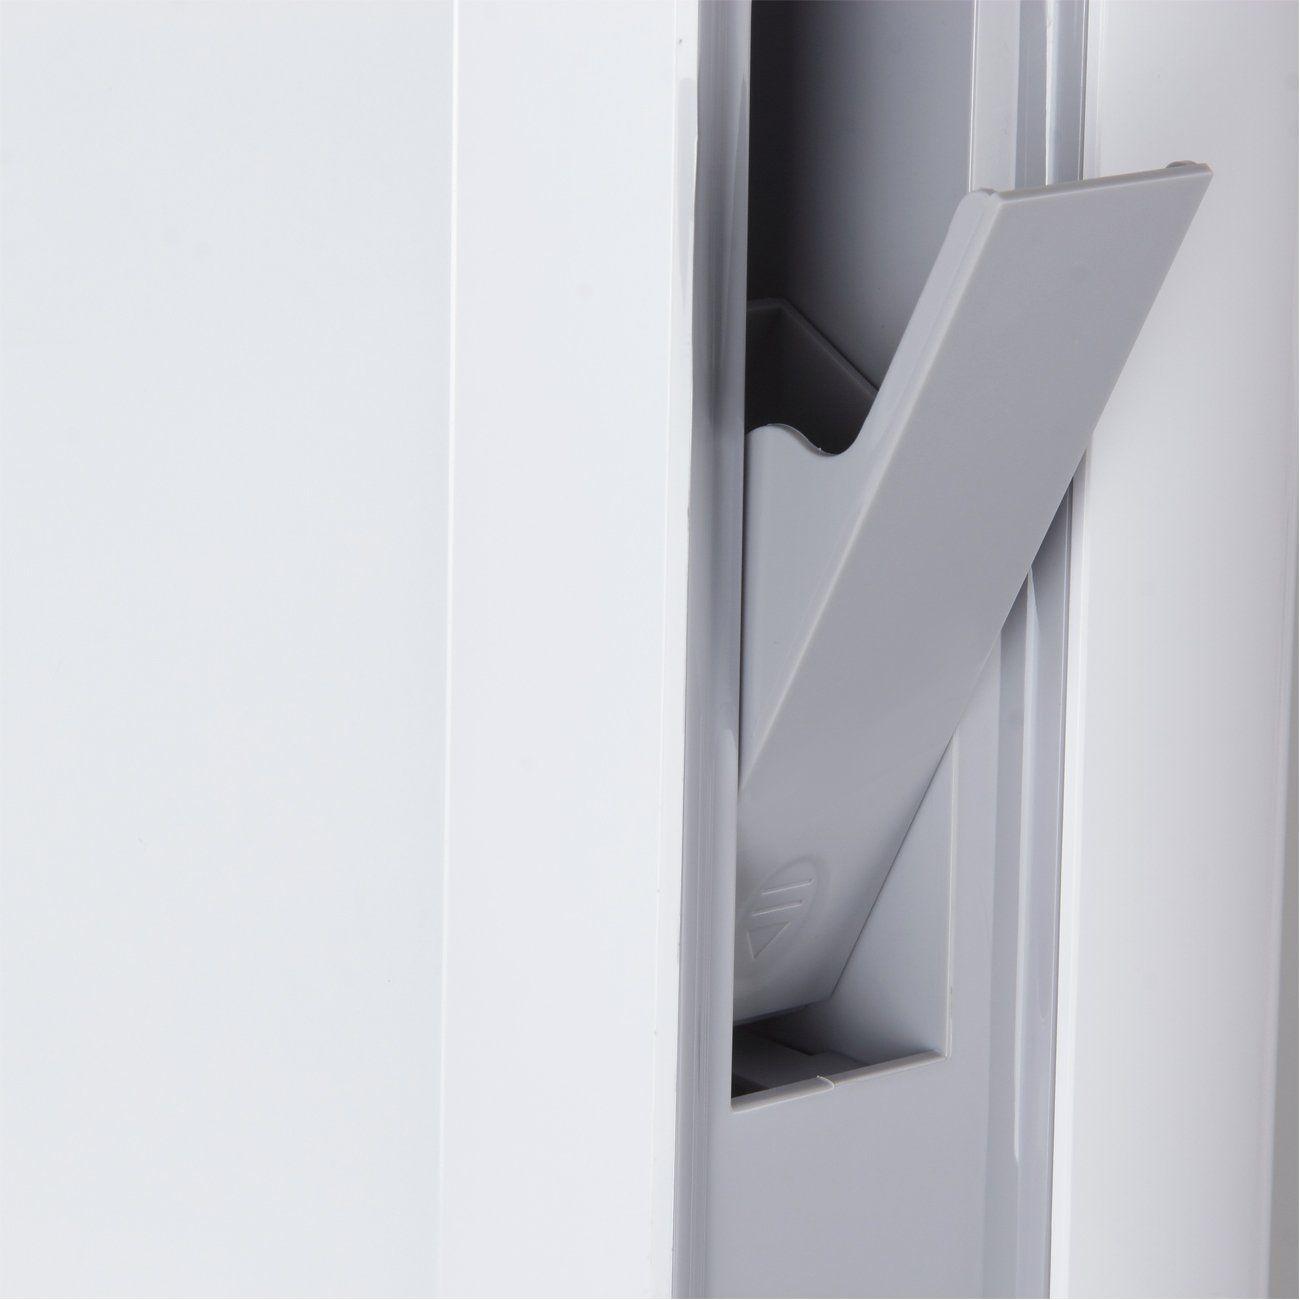 Della 14000 Btu Evaporative Portable Air Conditioner Heater